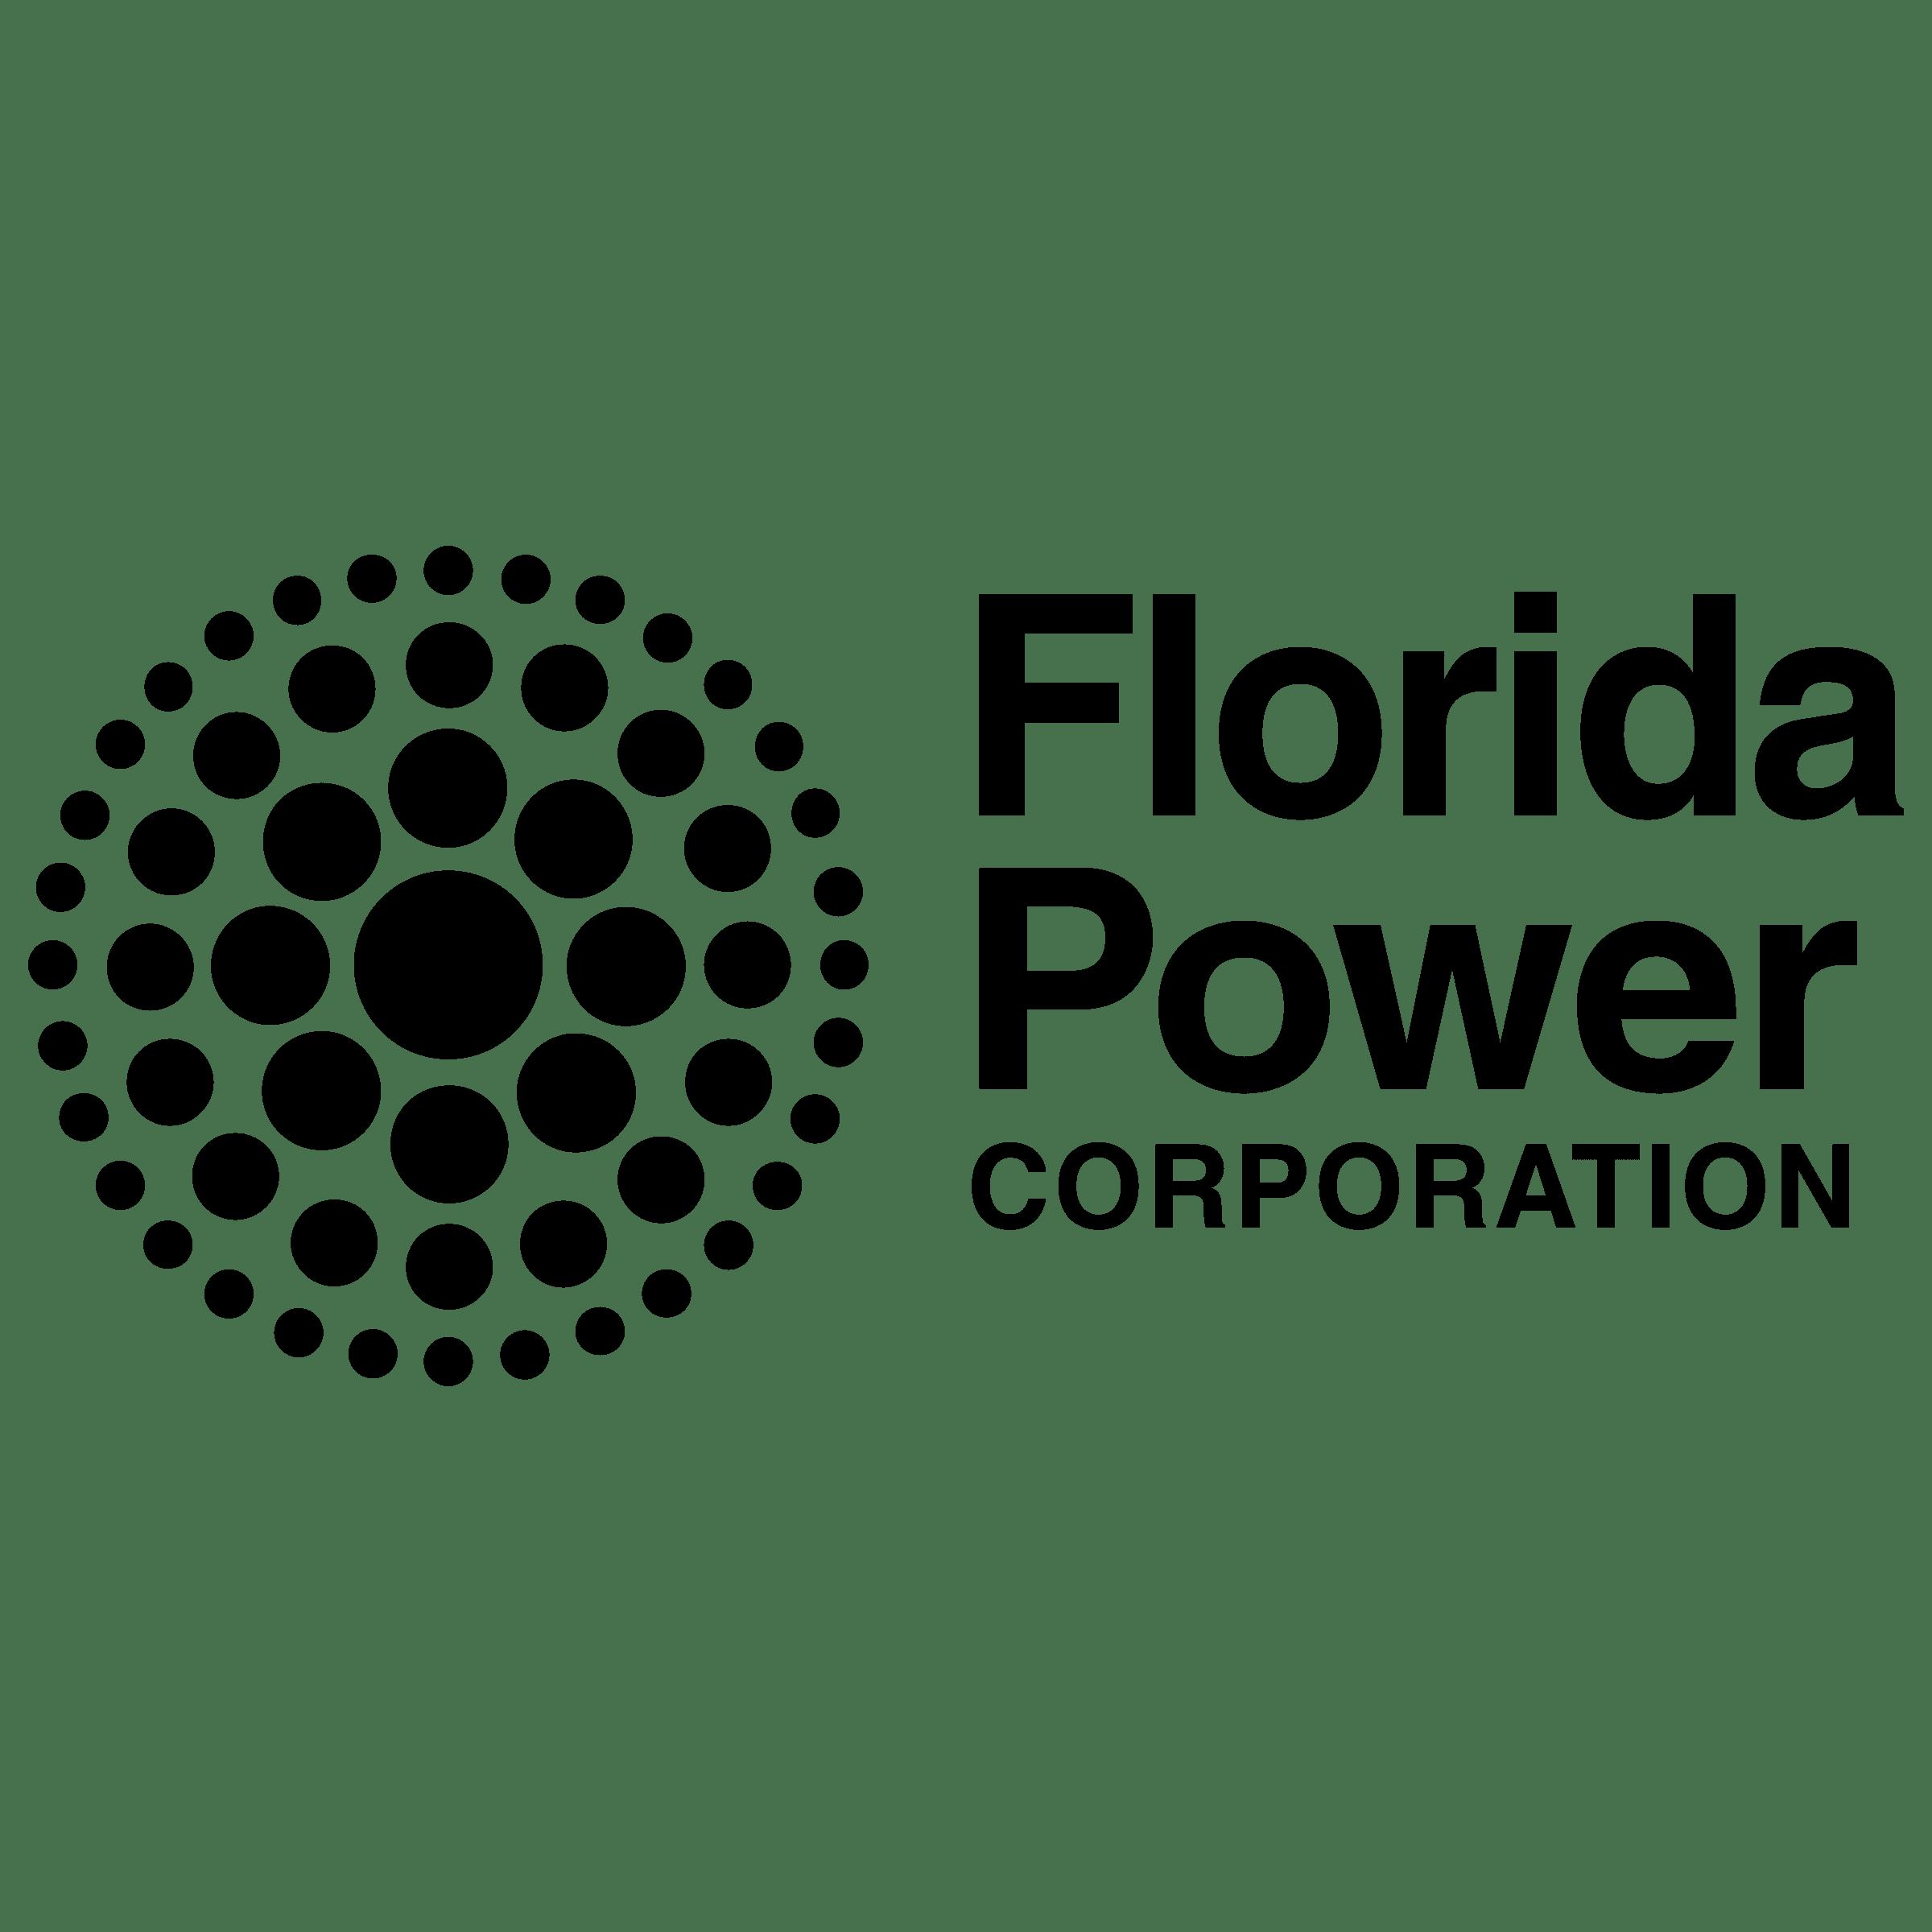 Florida Power